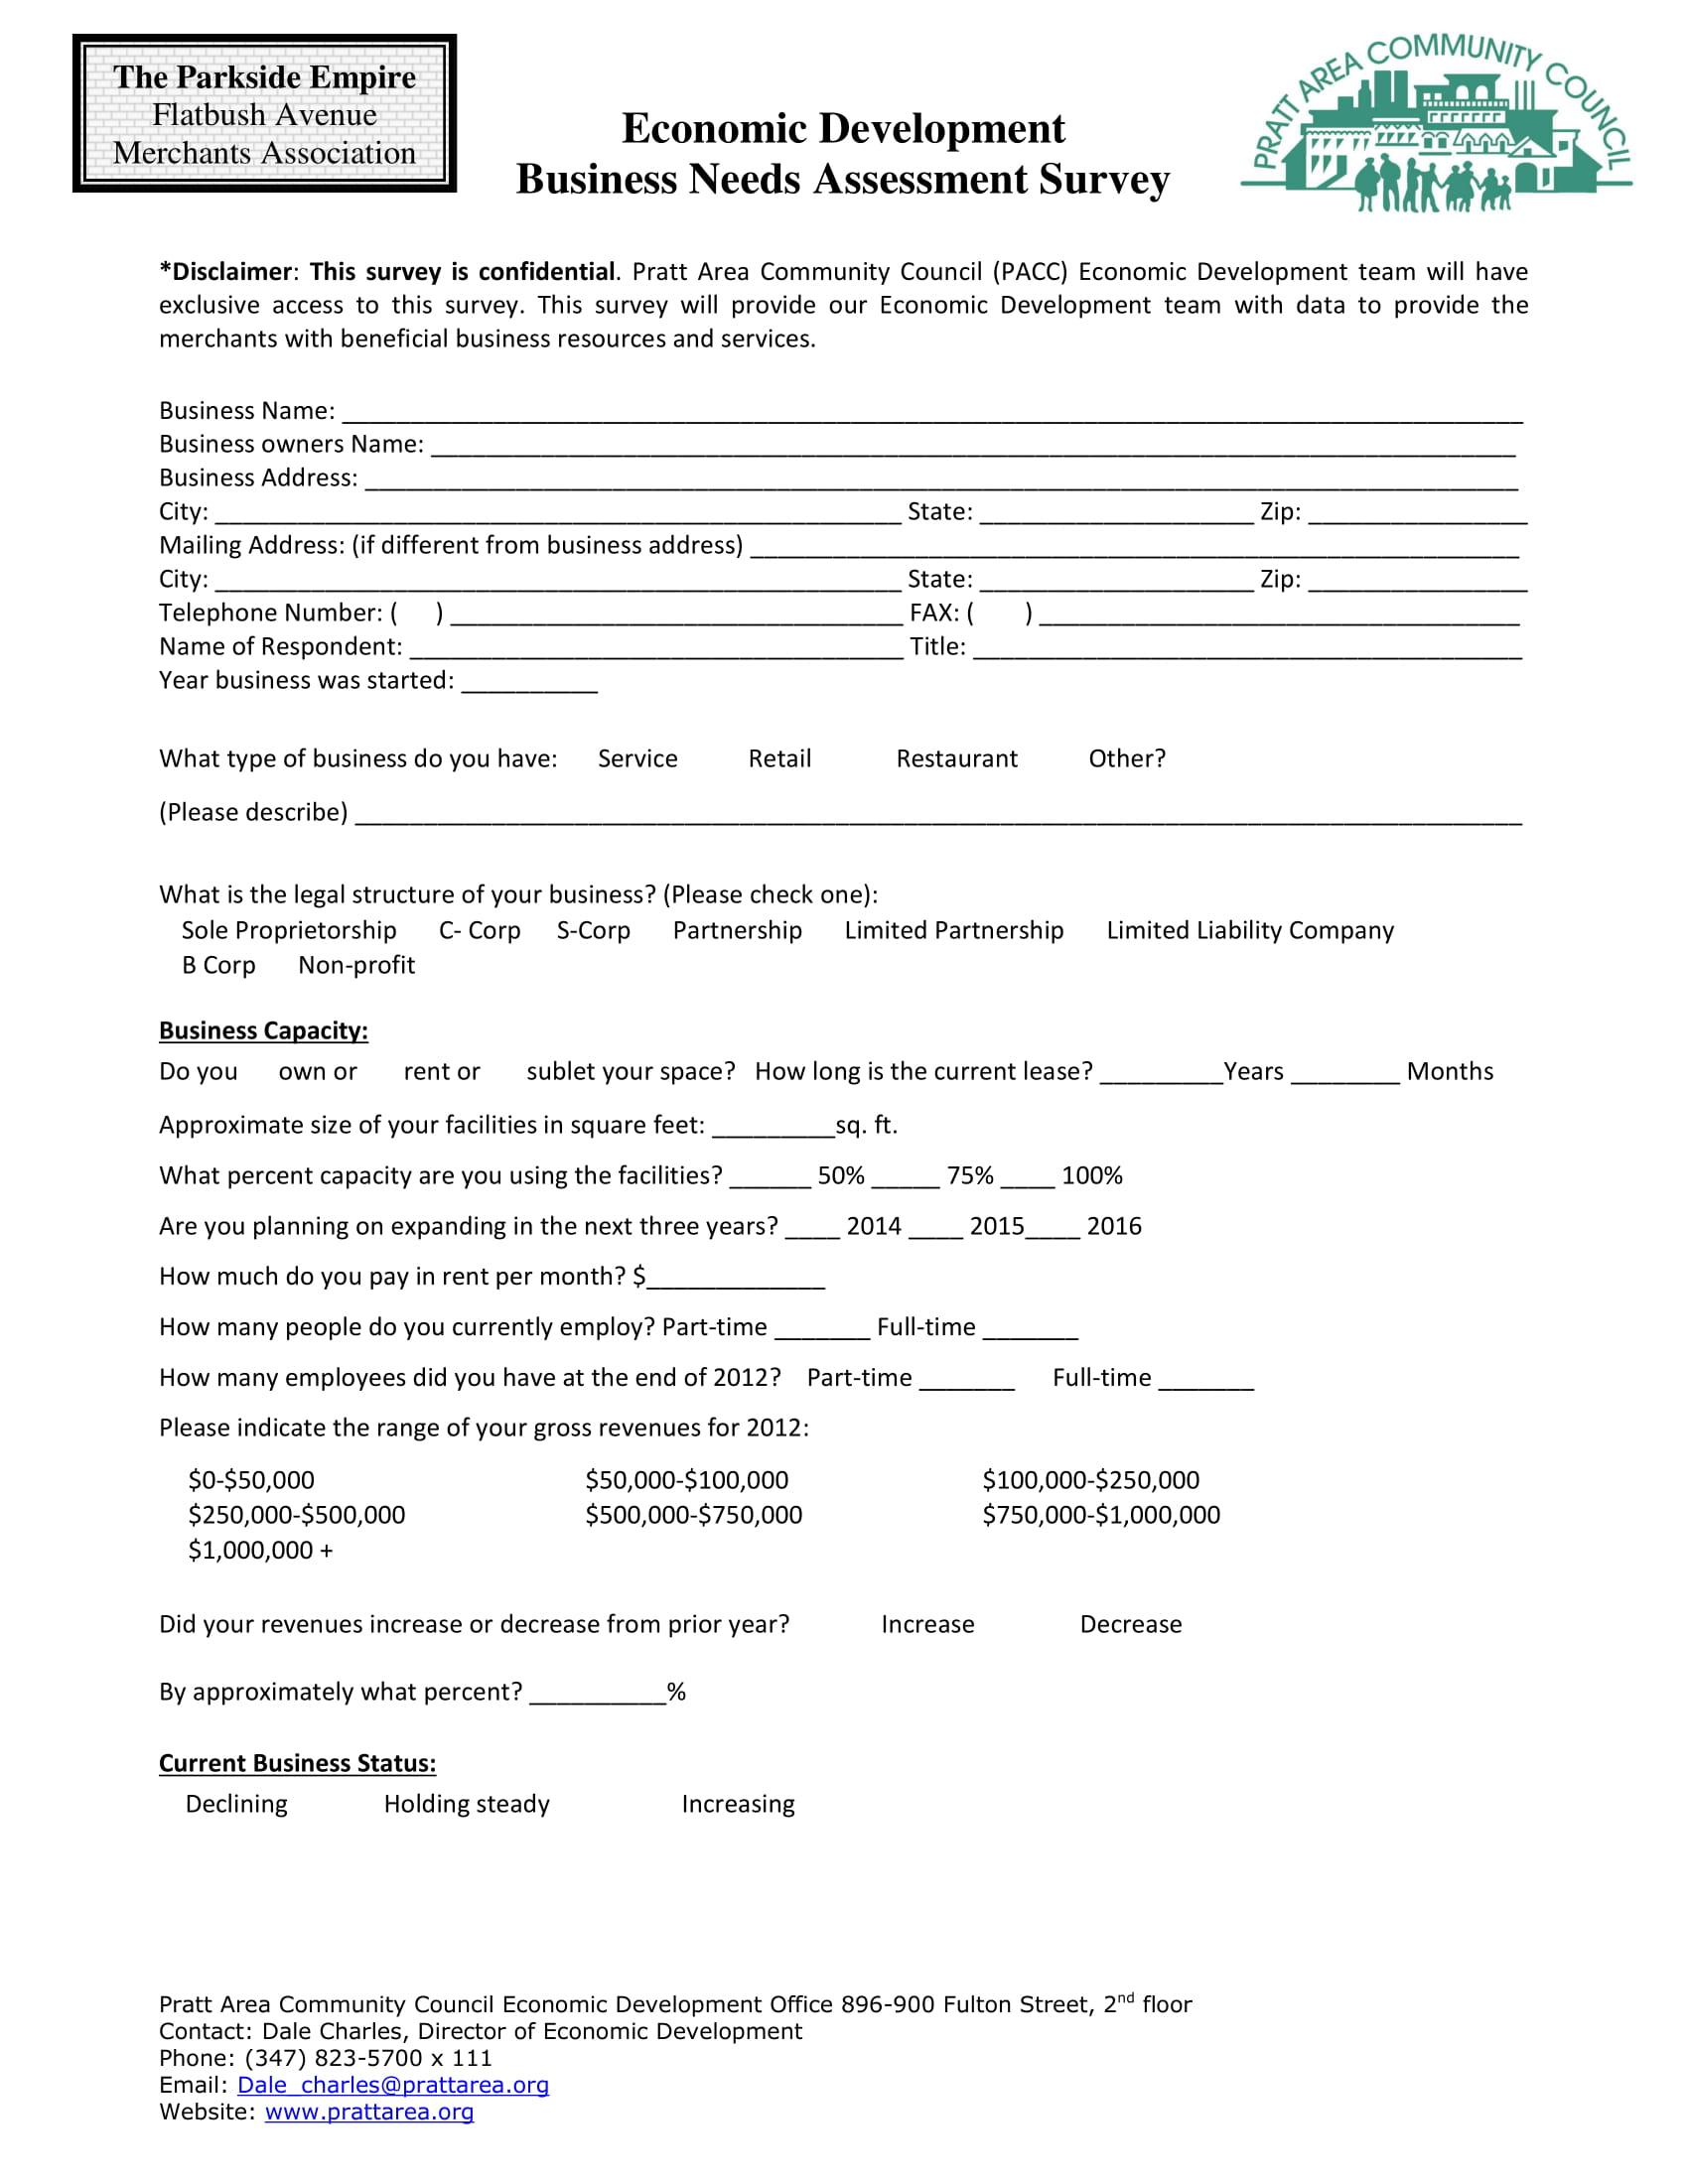 economic development business needs assessment survey example